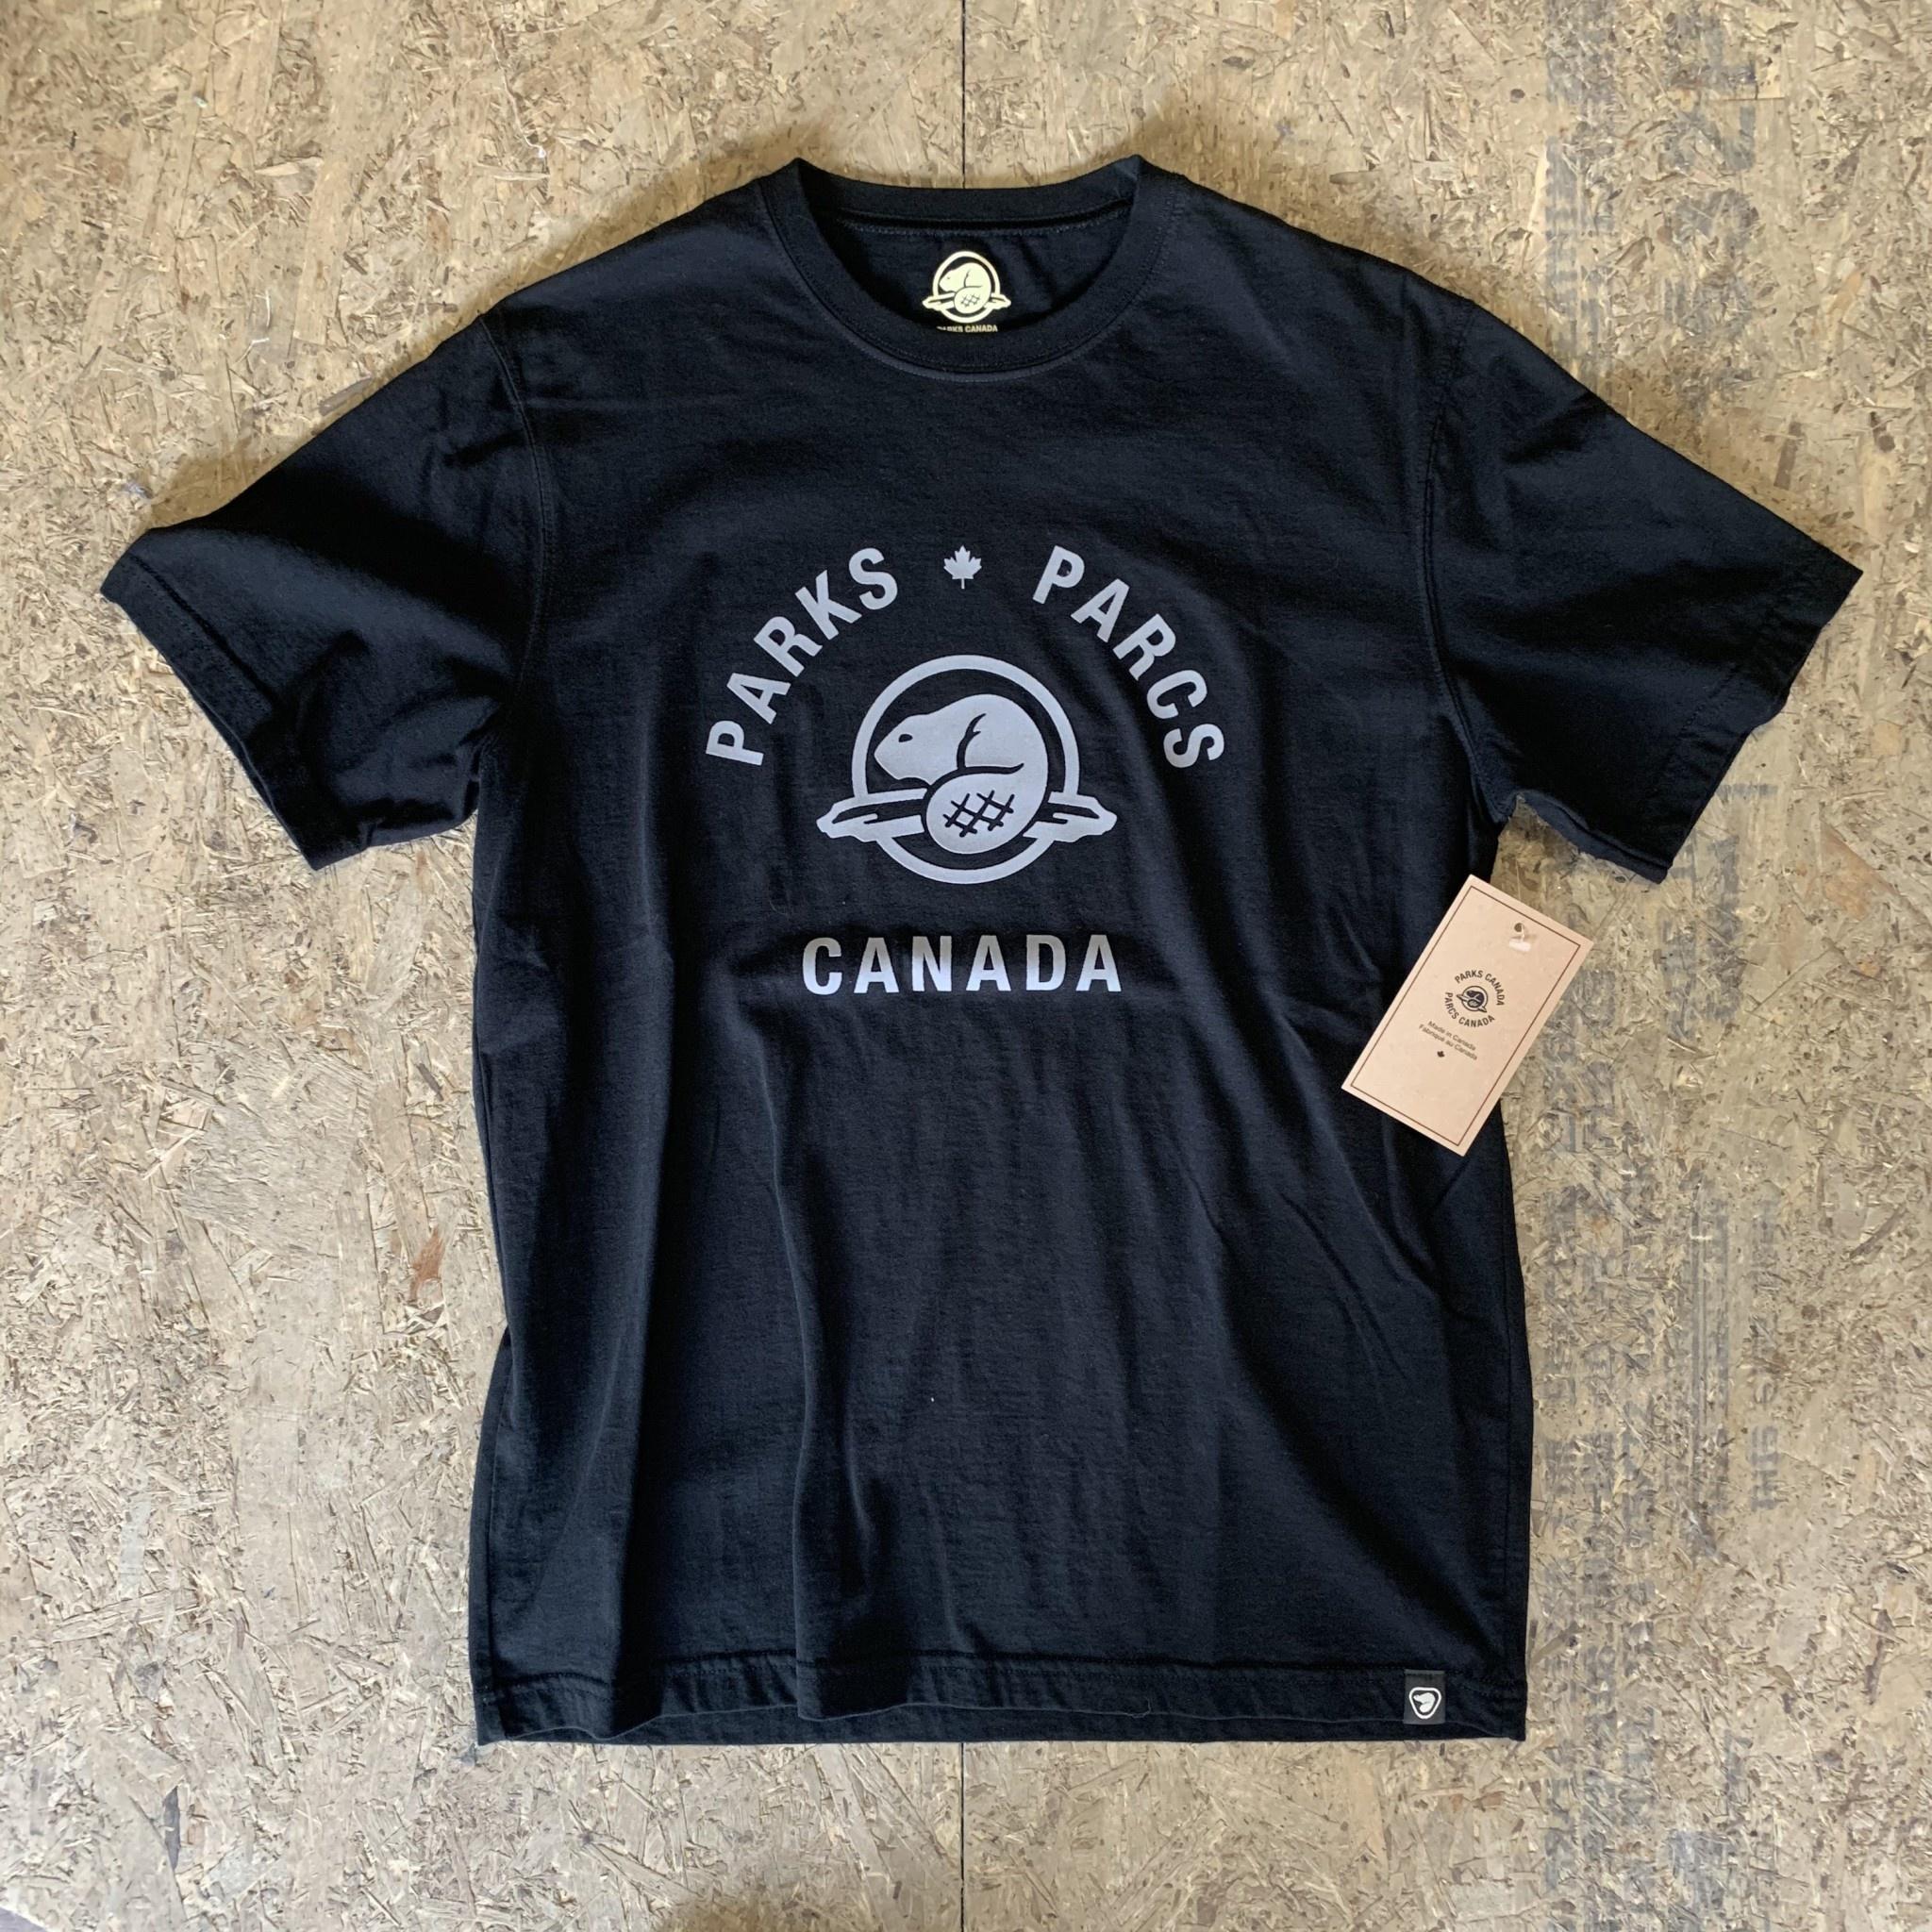 Parks Canada ParksCanada - Essential Tee - Blk - S